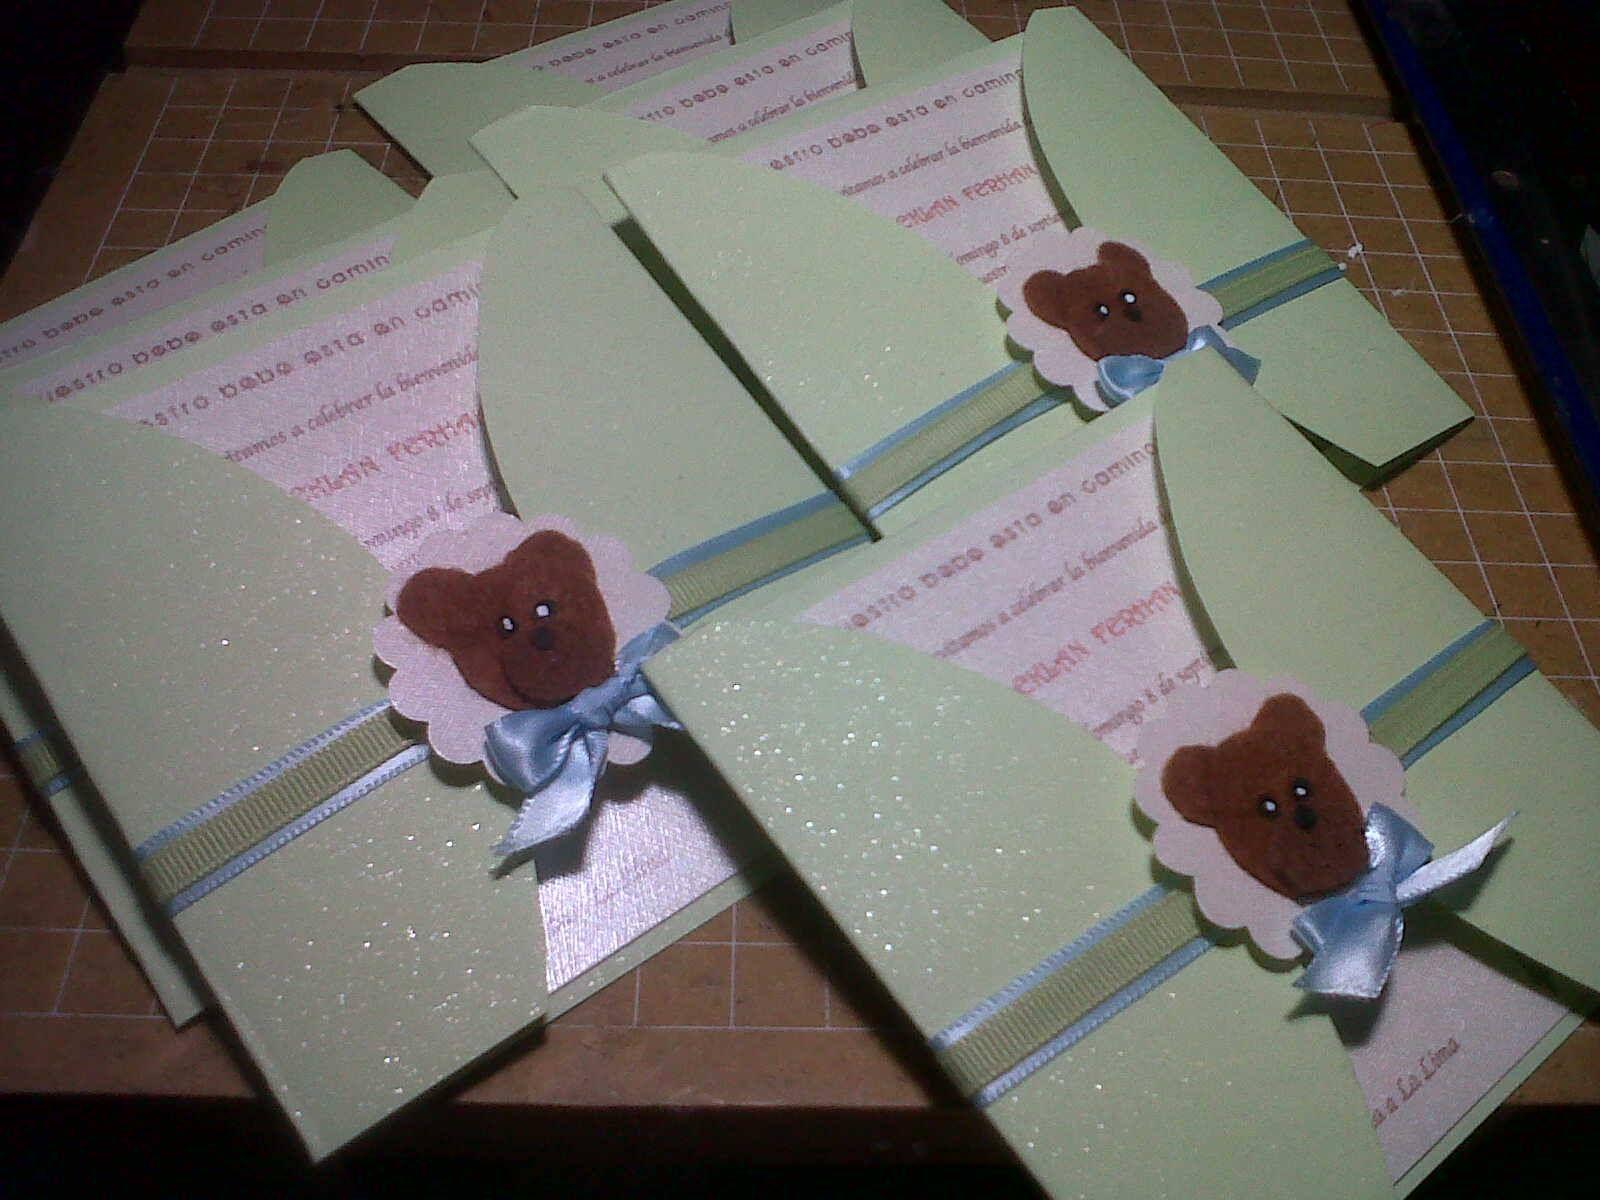 Clinton S Baby Shower Decorations ~ Best ideas de invitaciones para baby shower images